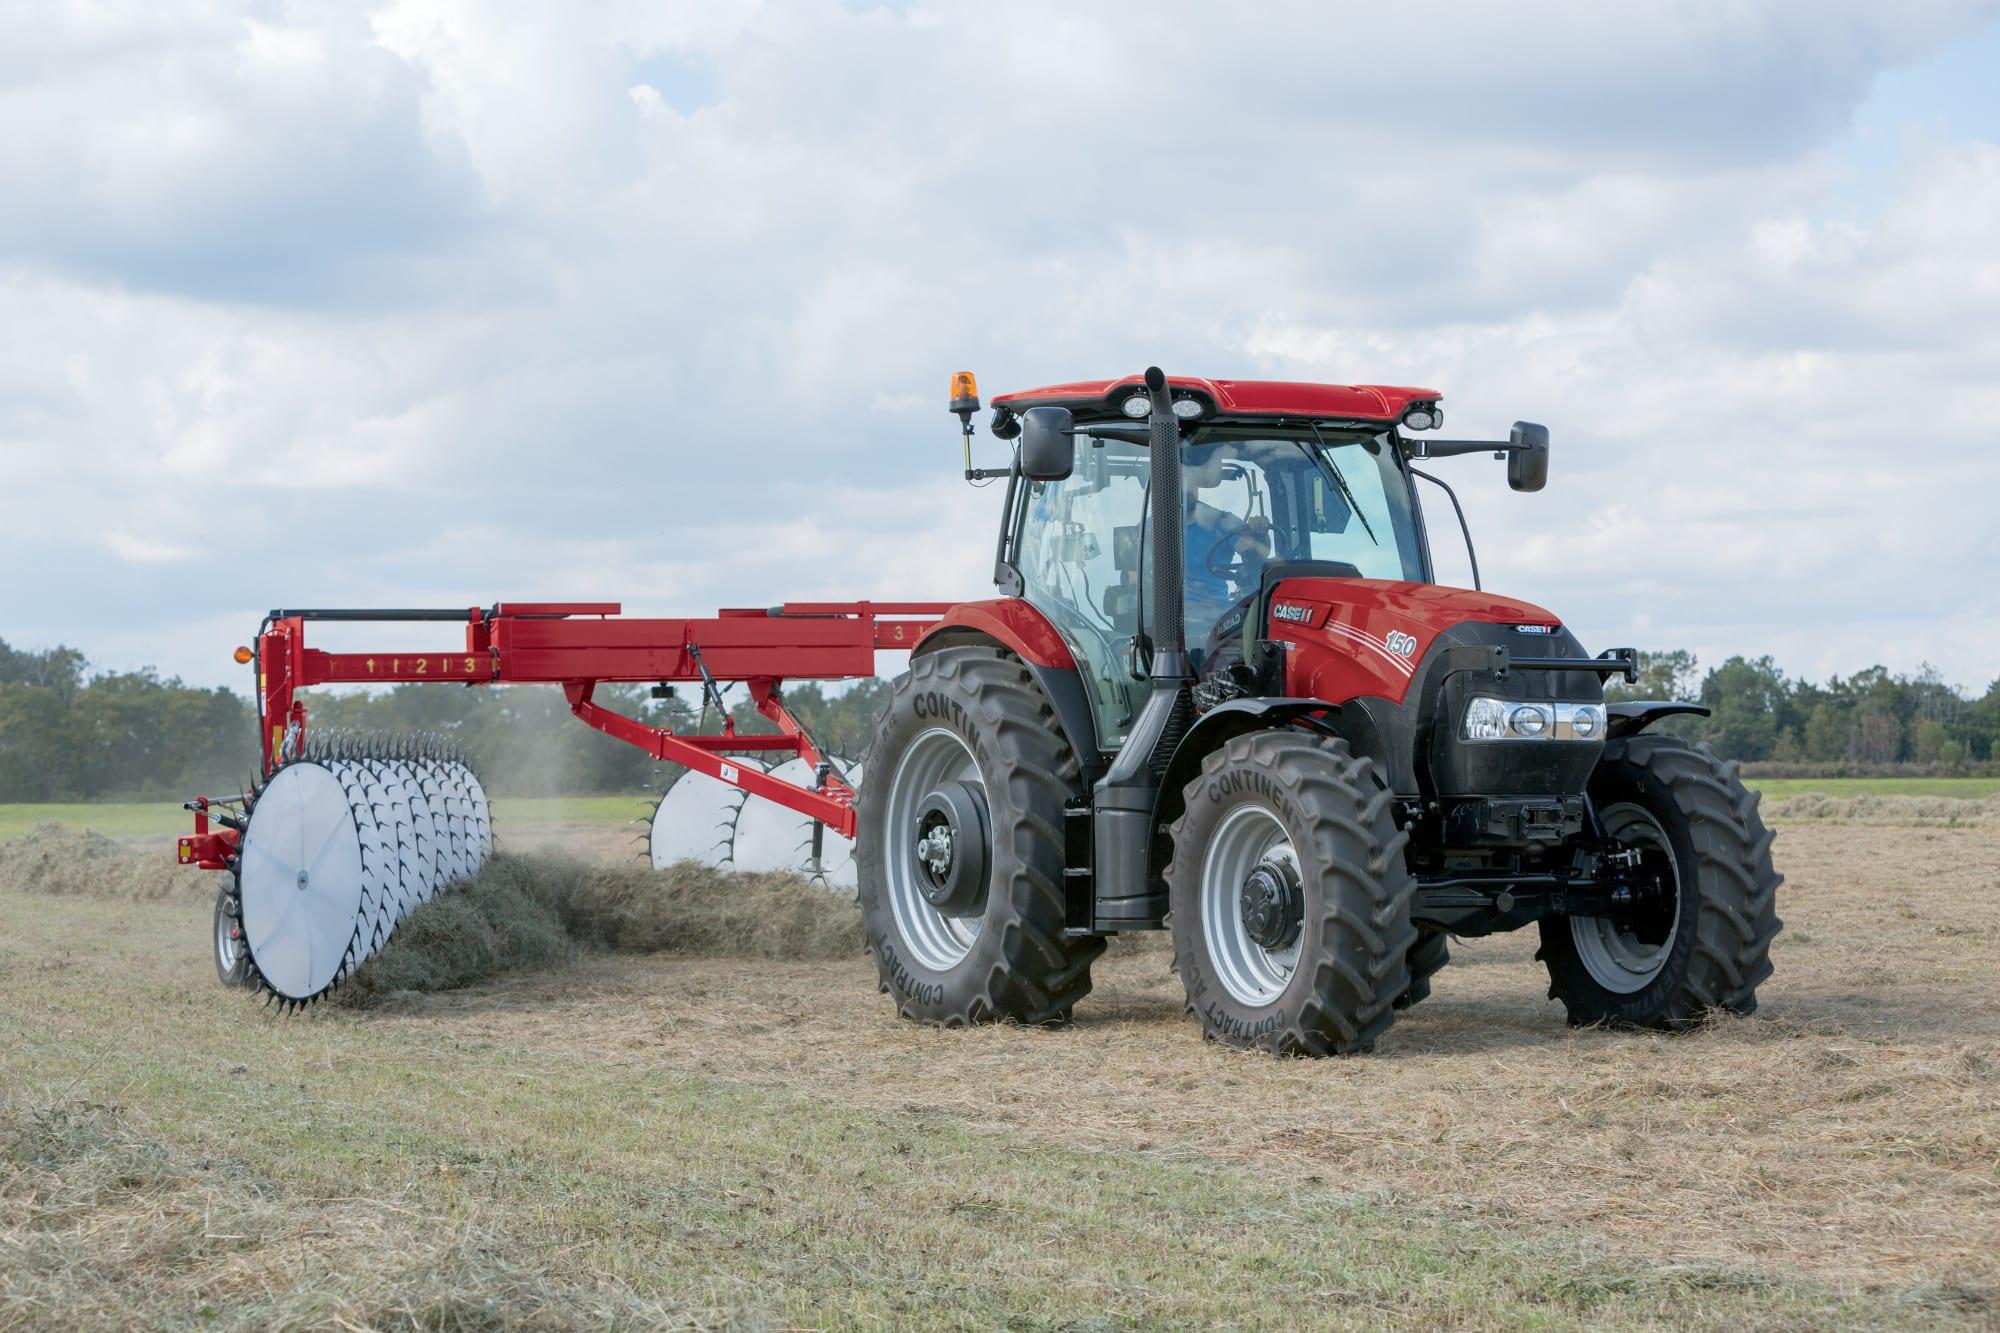 maxxum 150 4 wheel drive multipurpose tractors case ih rh caseih com Case IH Combine New Case IH Tractor